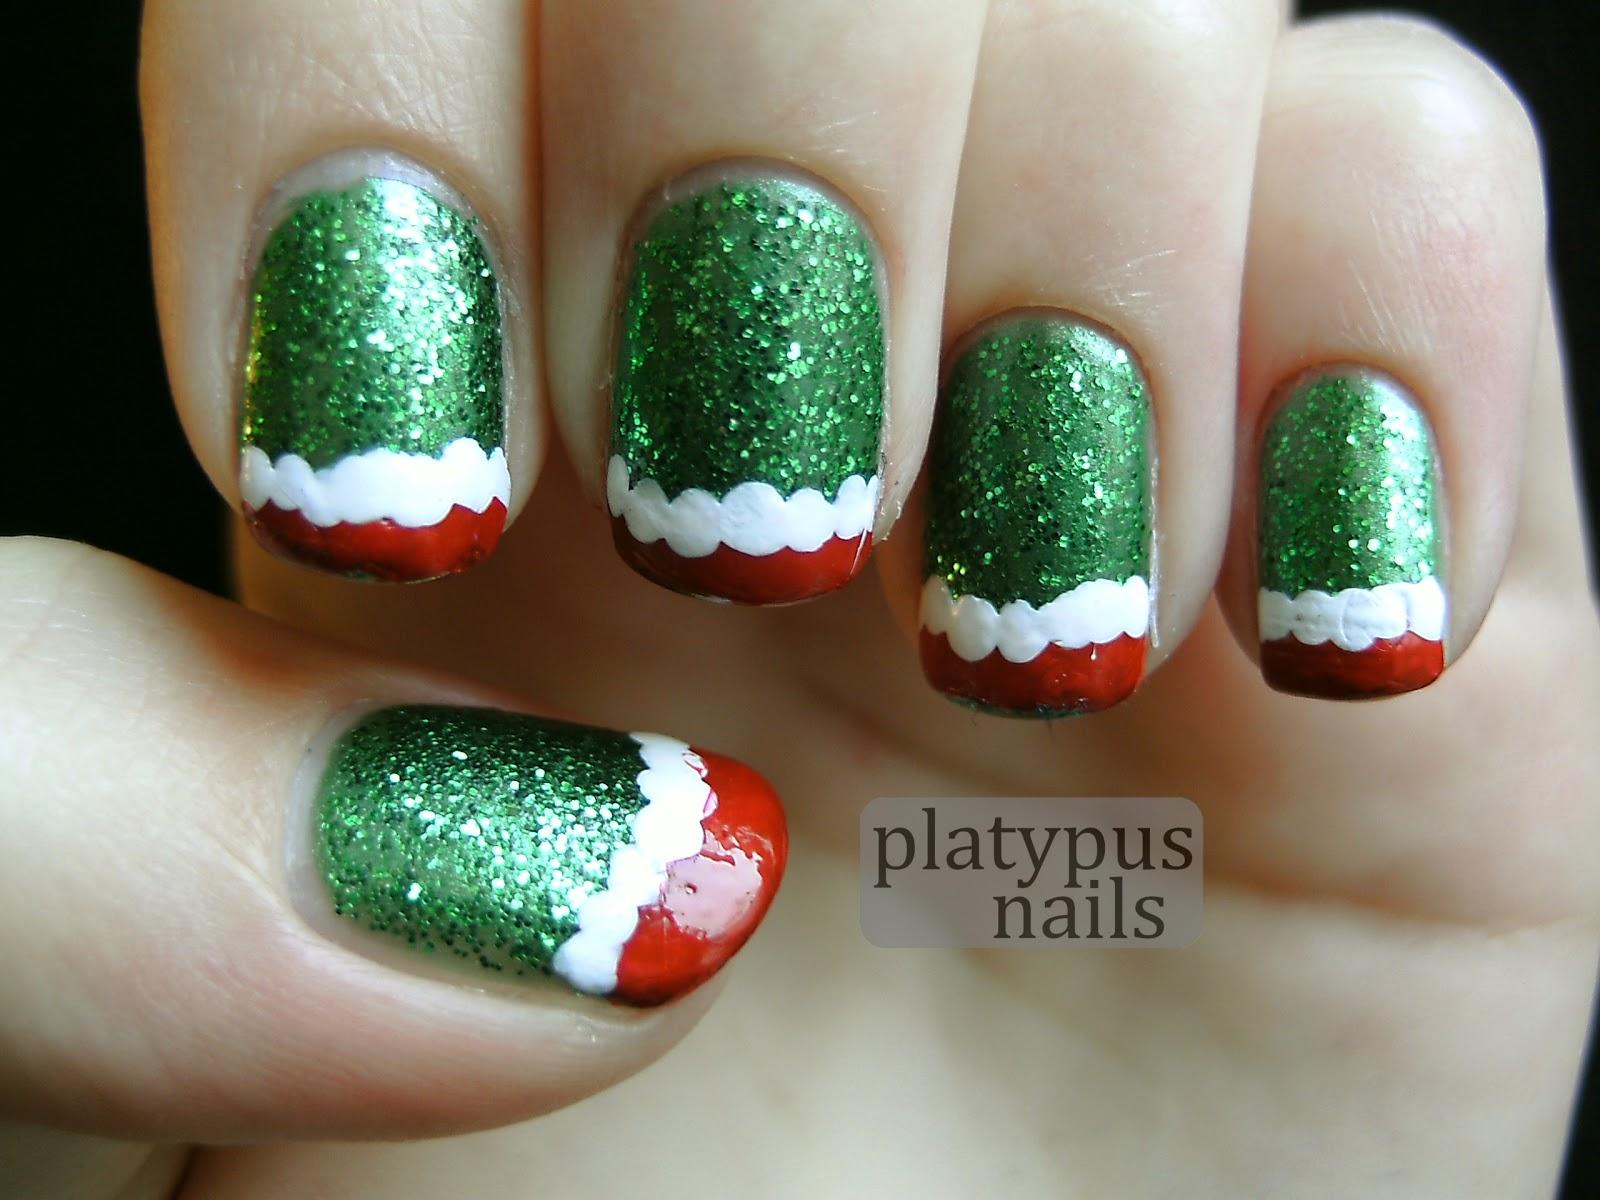 loonyplatypus: [nails] Festive Mani #4 - Christmas Tips